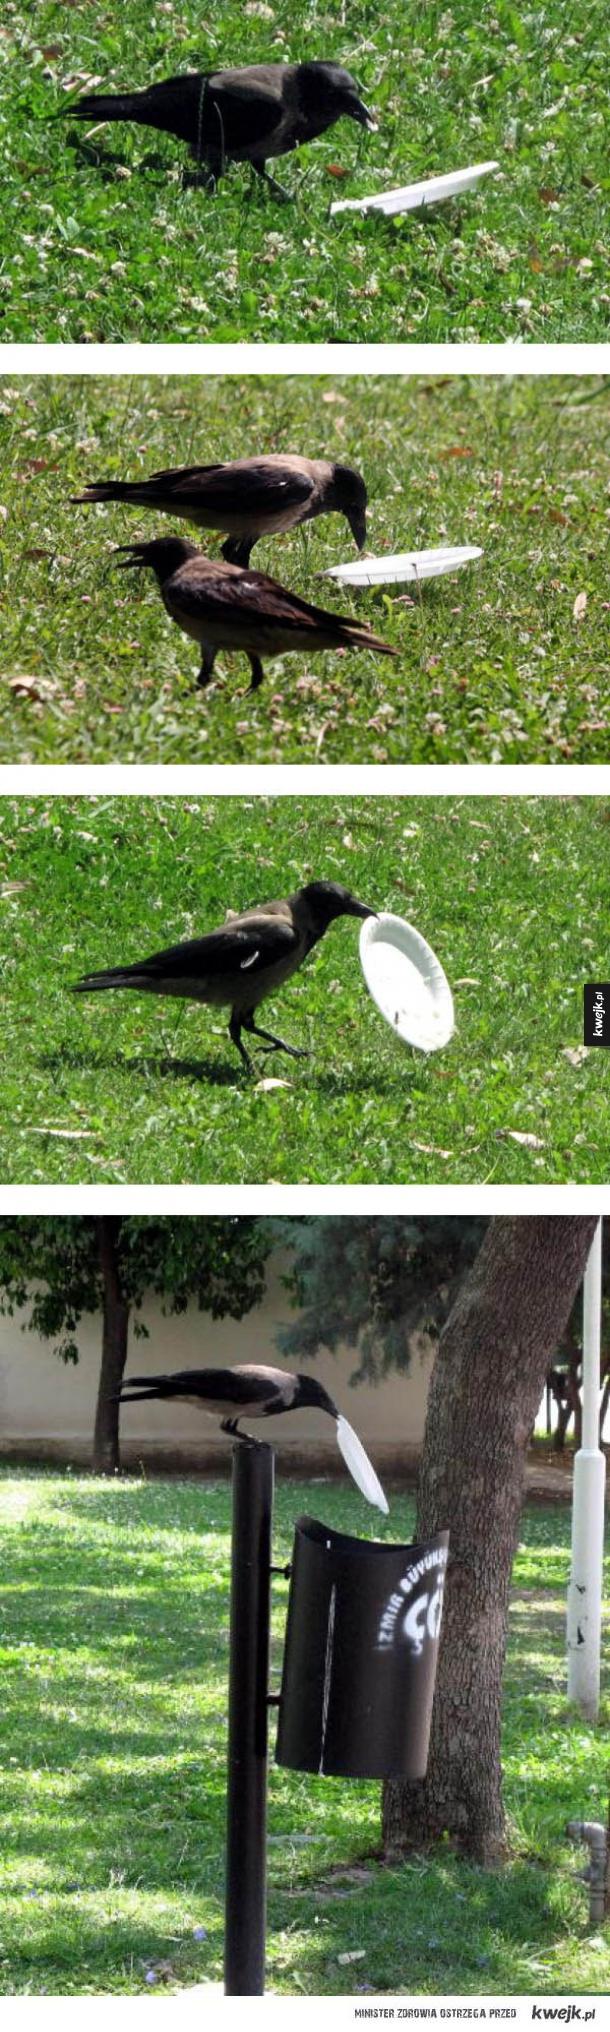 Kulturalny ptak